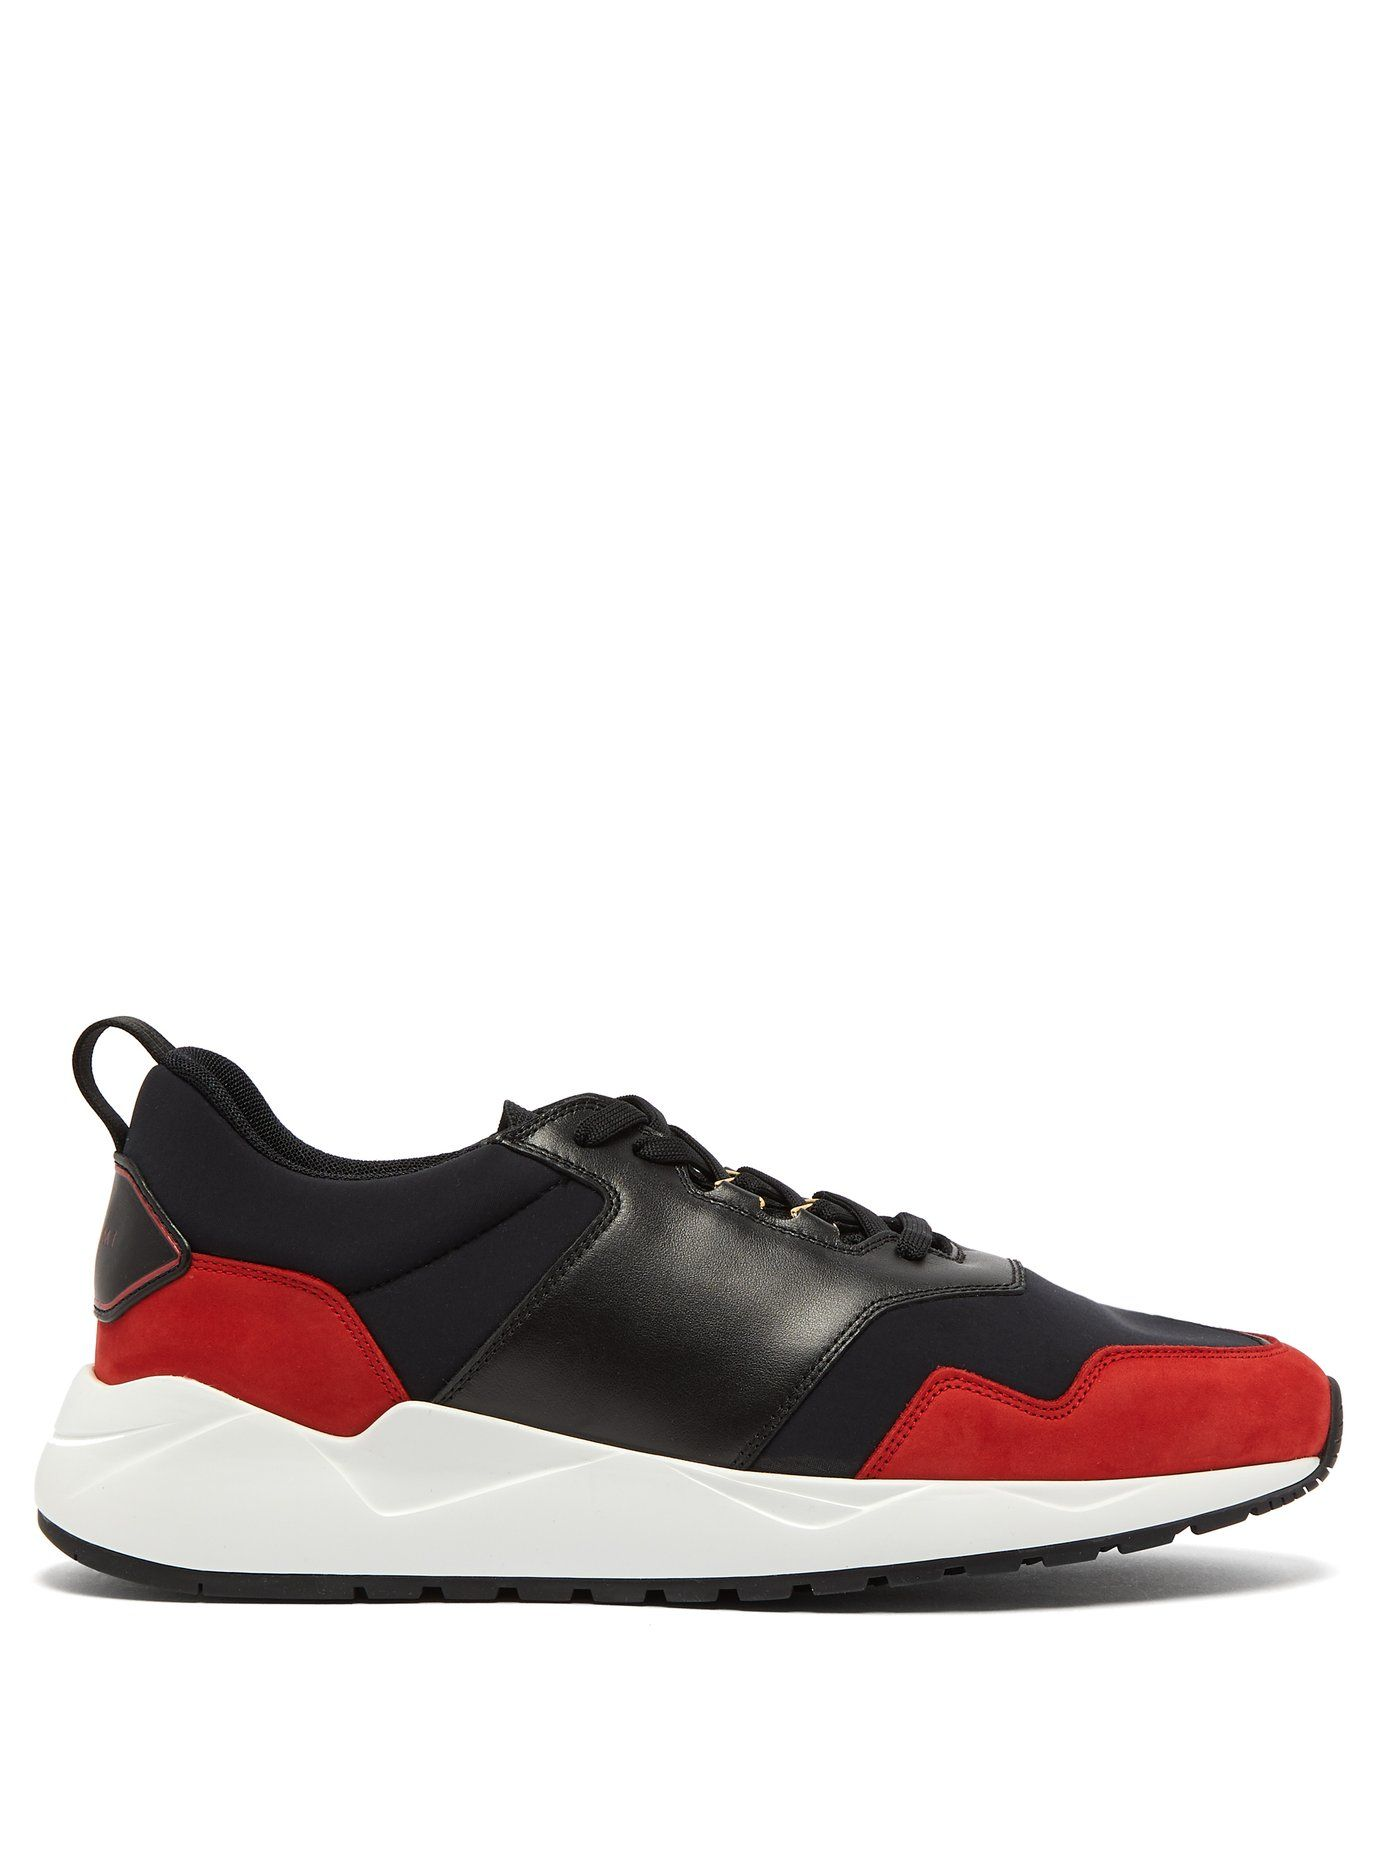 Buscemi Ventura trainers | Sapatos, Casual